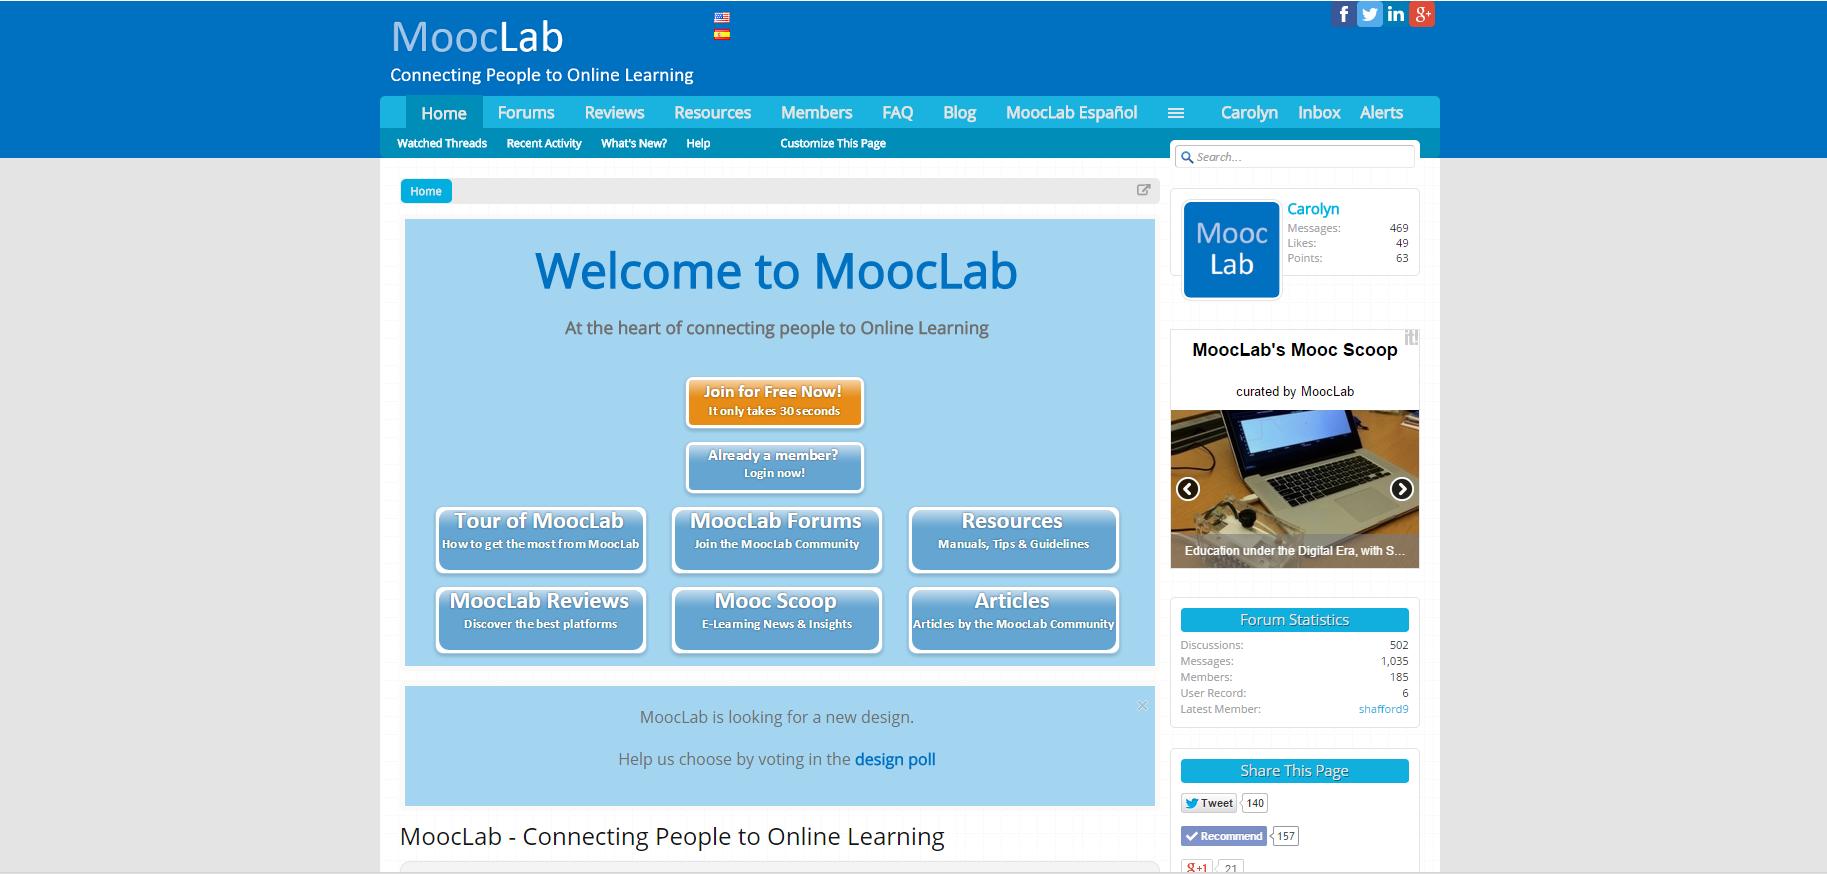 MoocLab screenshot 290515.png